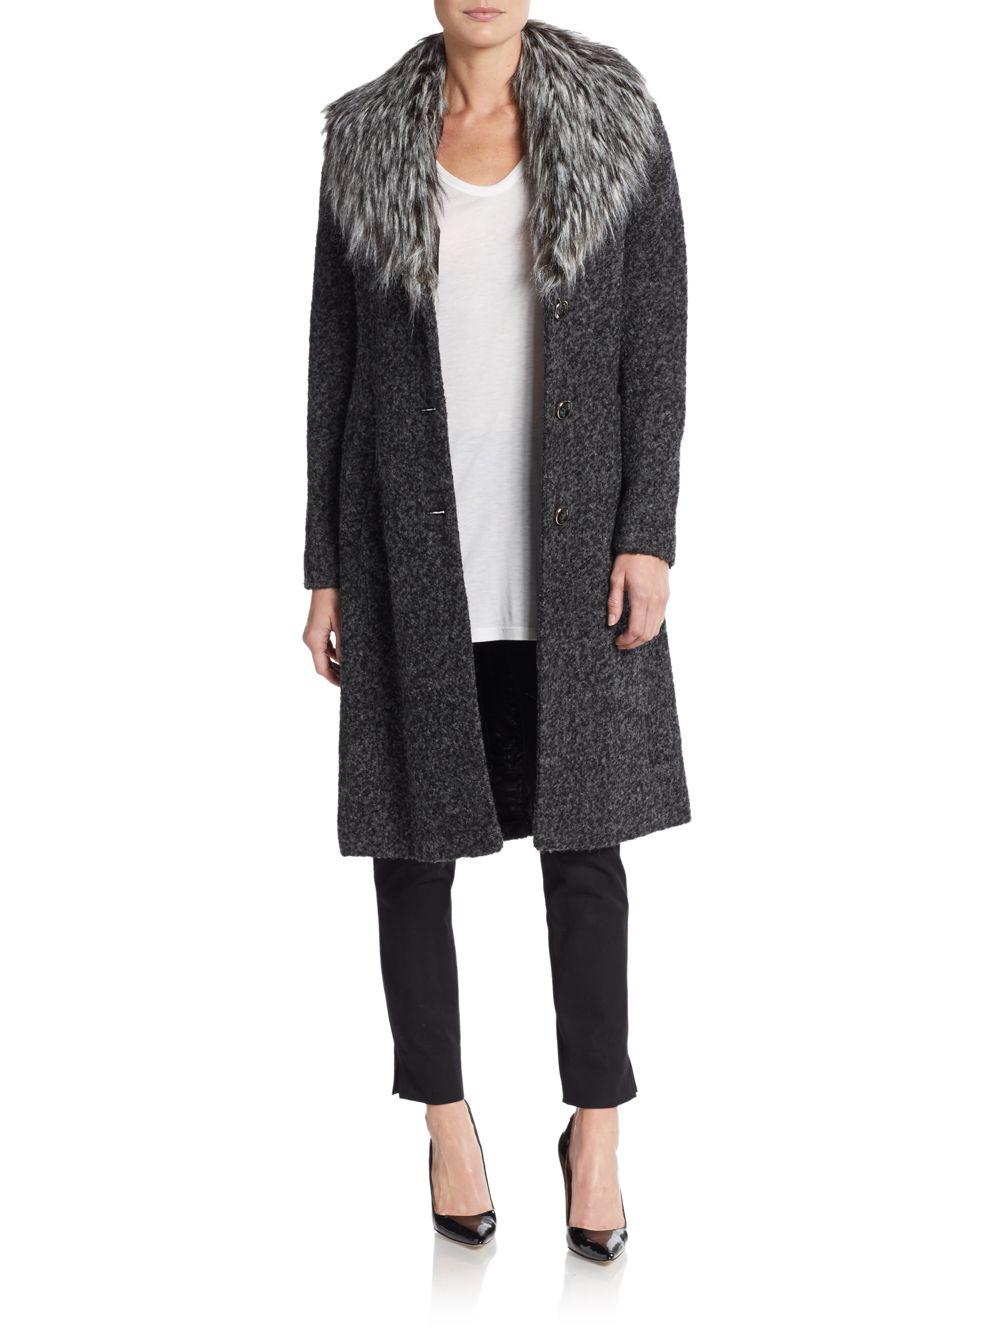 Ivanka Trump Boucle Faux Fur Trimmed Coat In Black Lyst